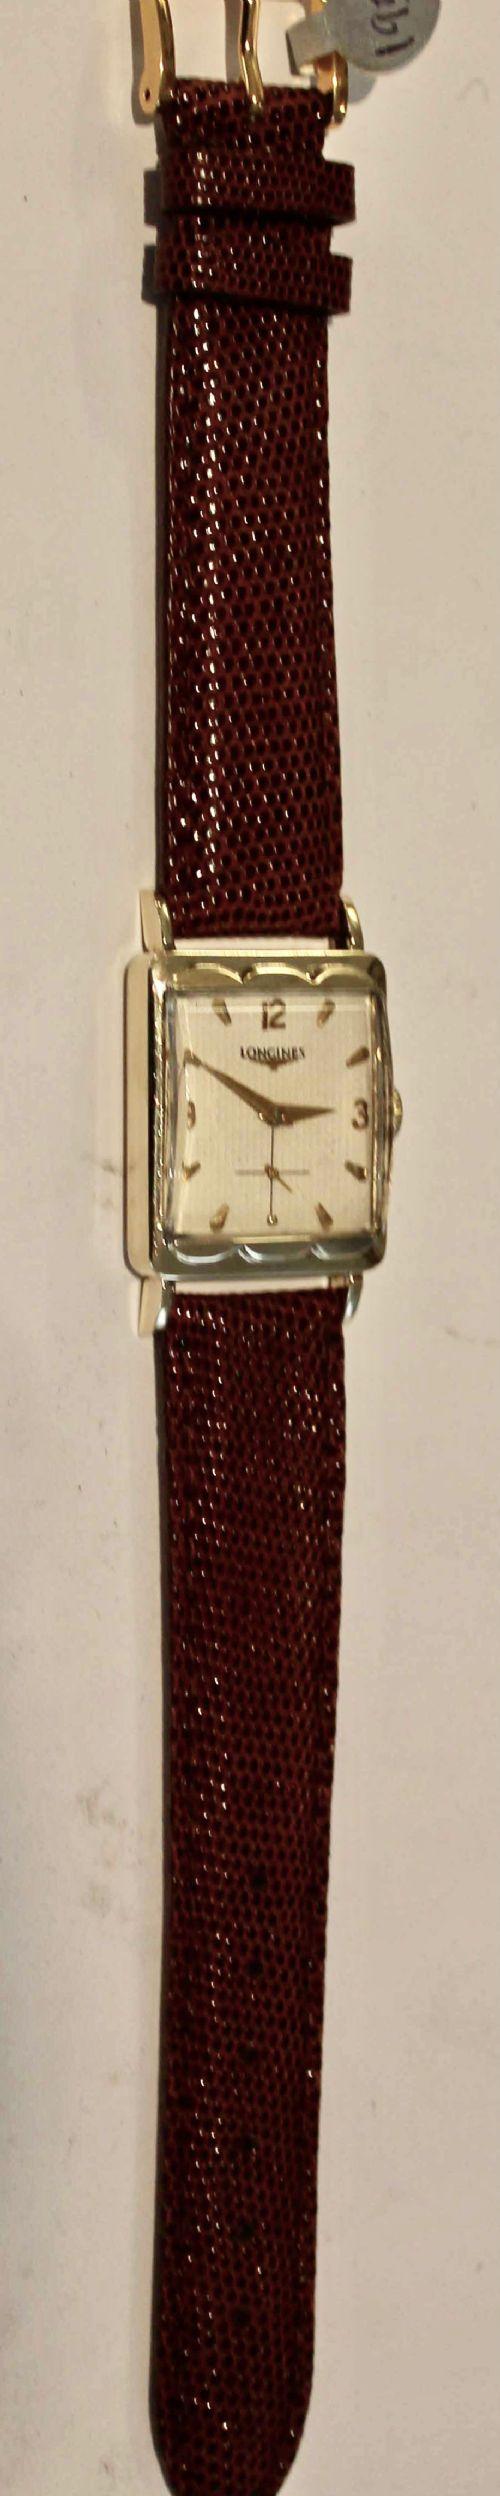 fine swiss 14ct gold longines wrist watch with 17 jewel handwound movement 1952 model restored with 2year guarantee